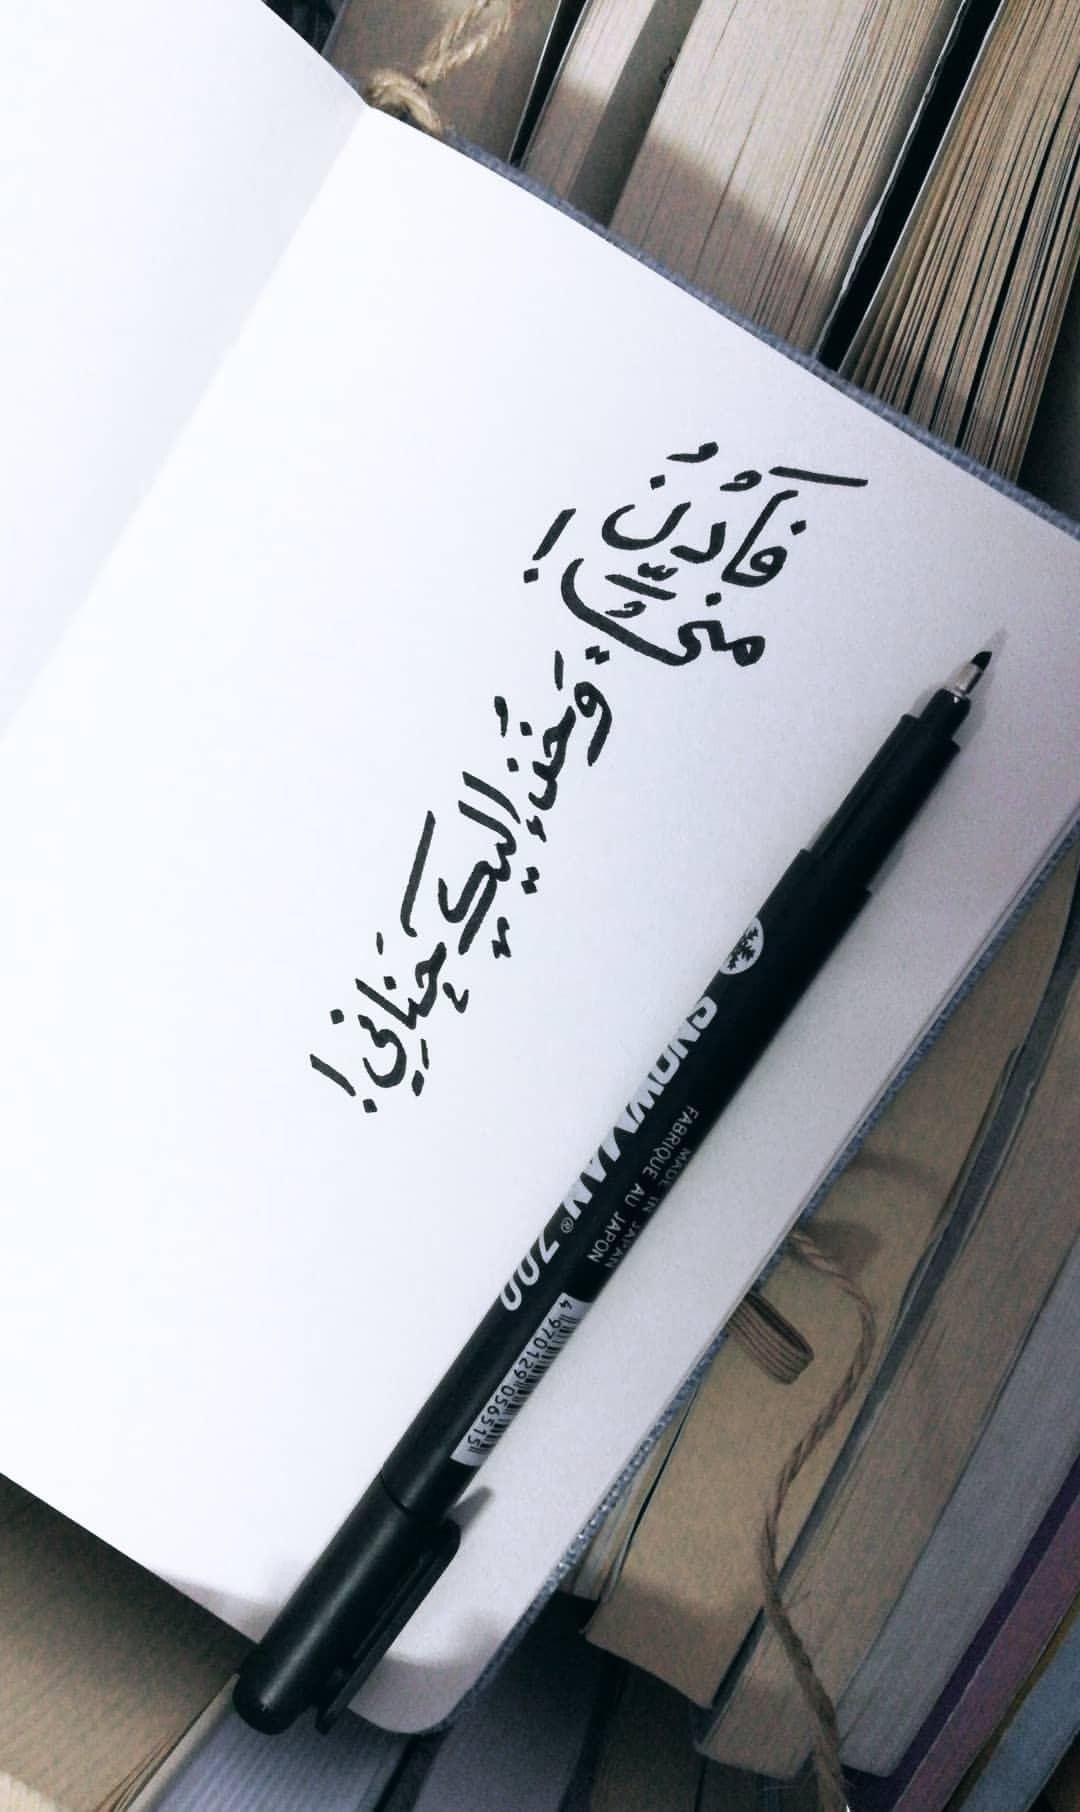 ام كلثوم كوكب الشرق خط عربي Photo Quotes Cards Against Humanity Calligraphy Fonts